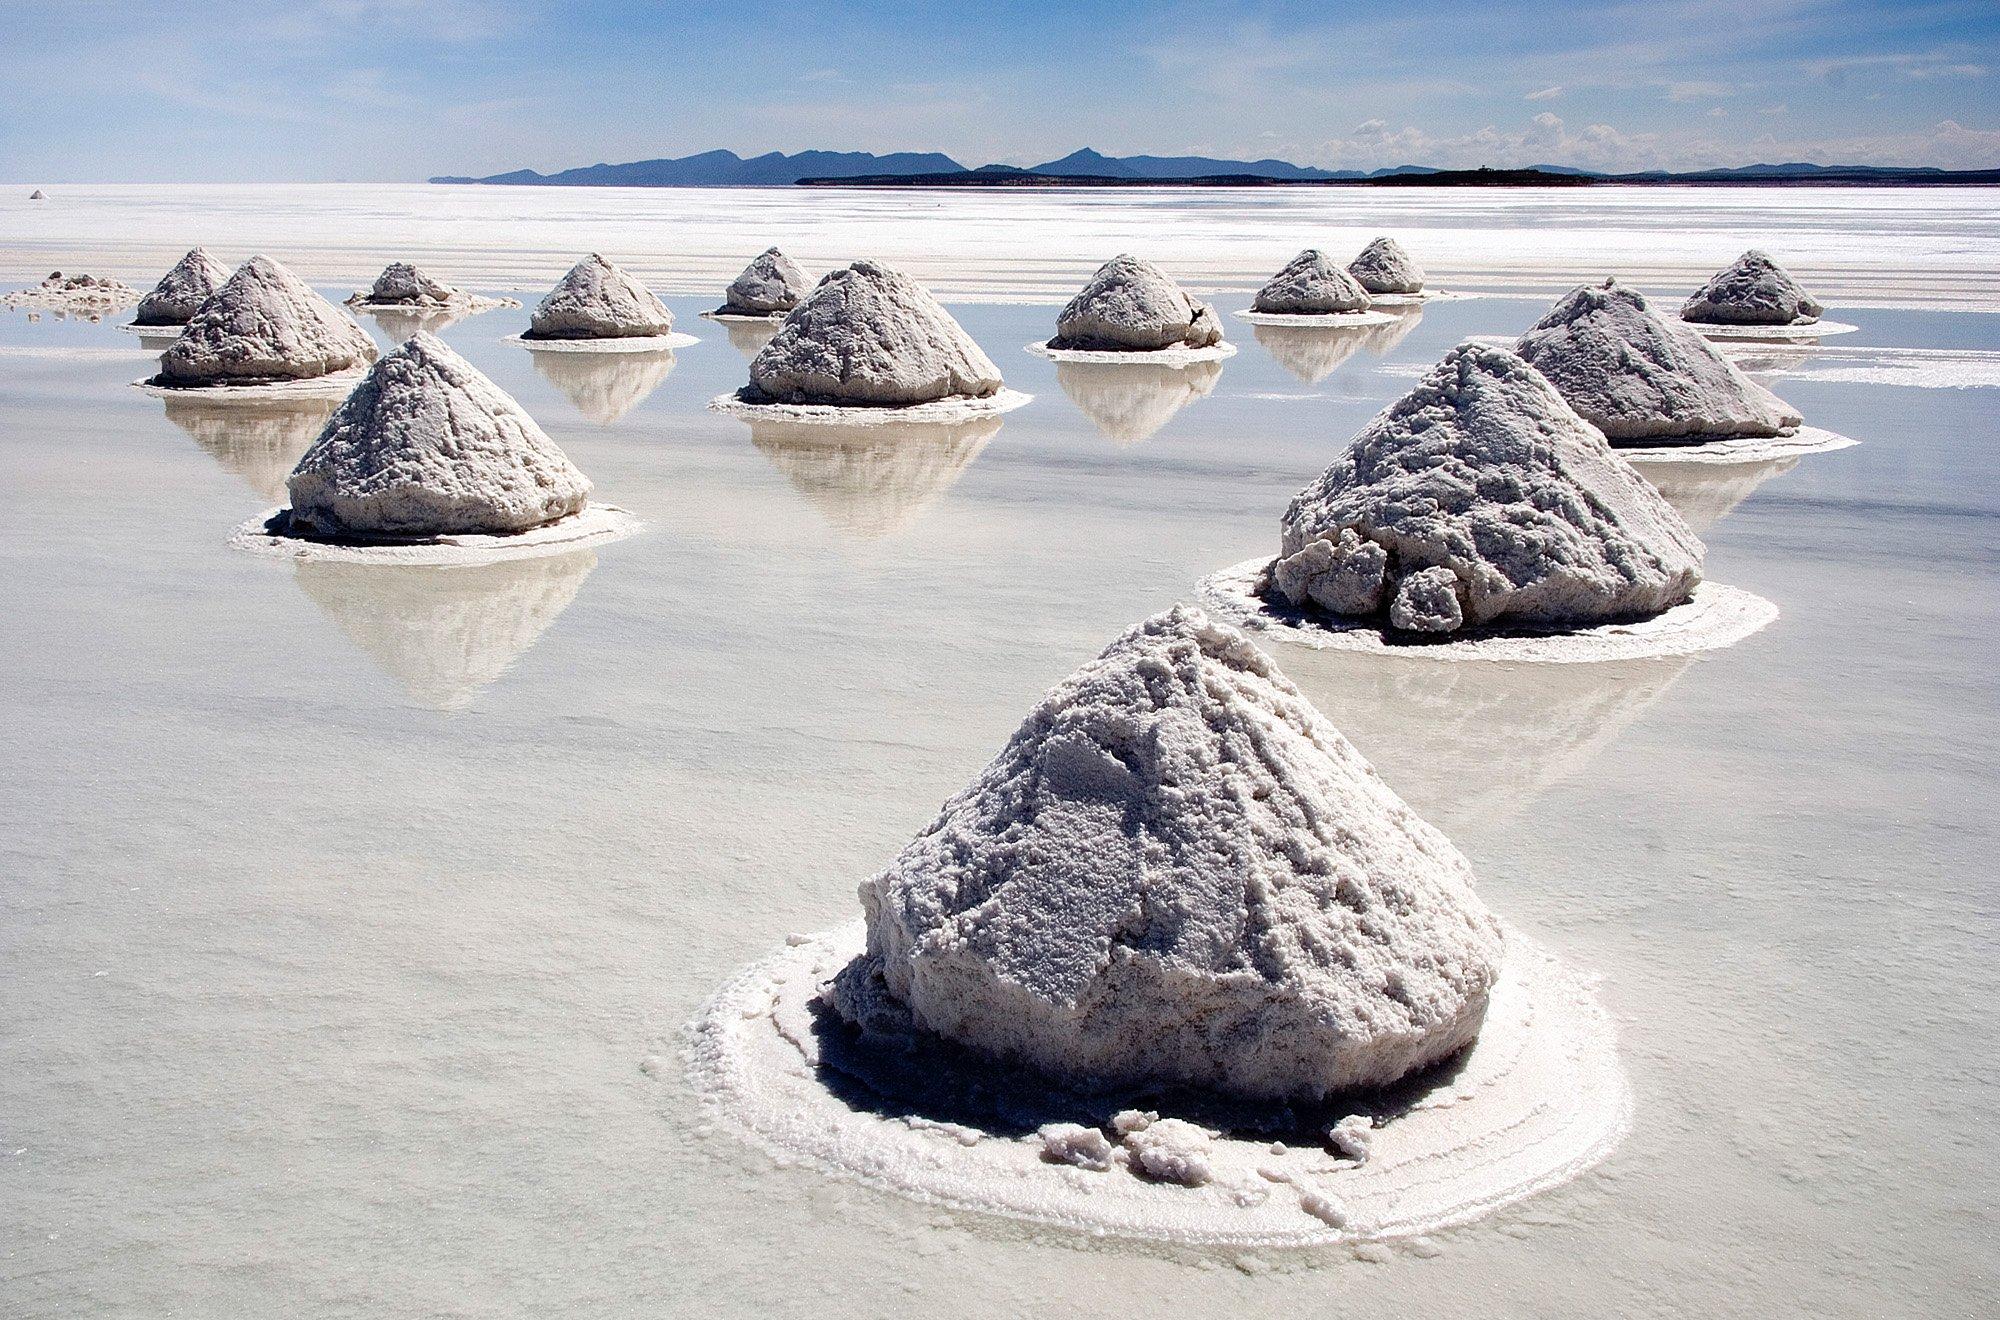 Piles_of_Salt_Salar_de_Uyuni_Bolivia_Luca_Galuzzi_2006_a-1.jpg